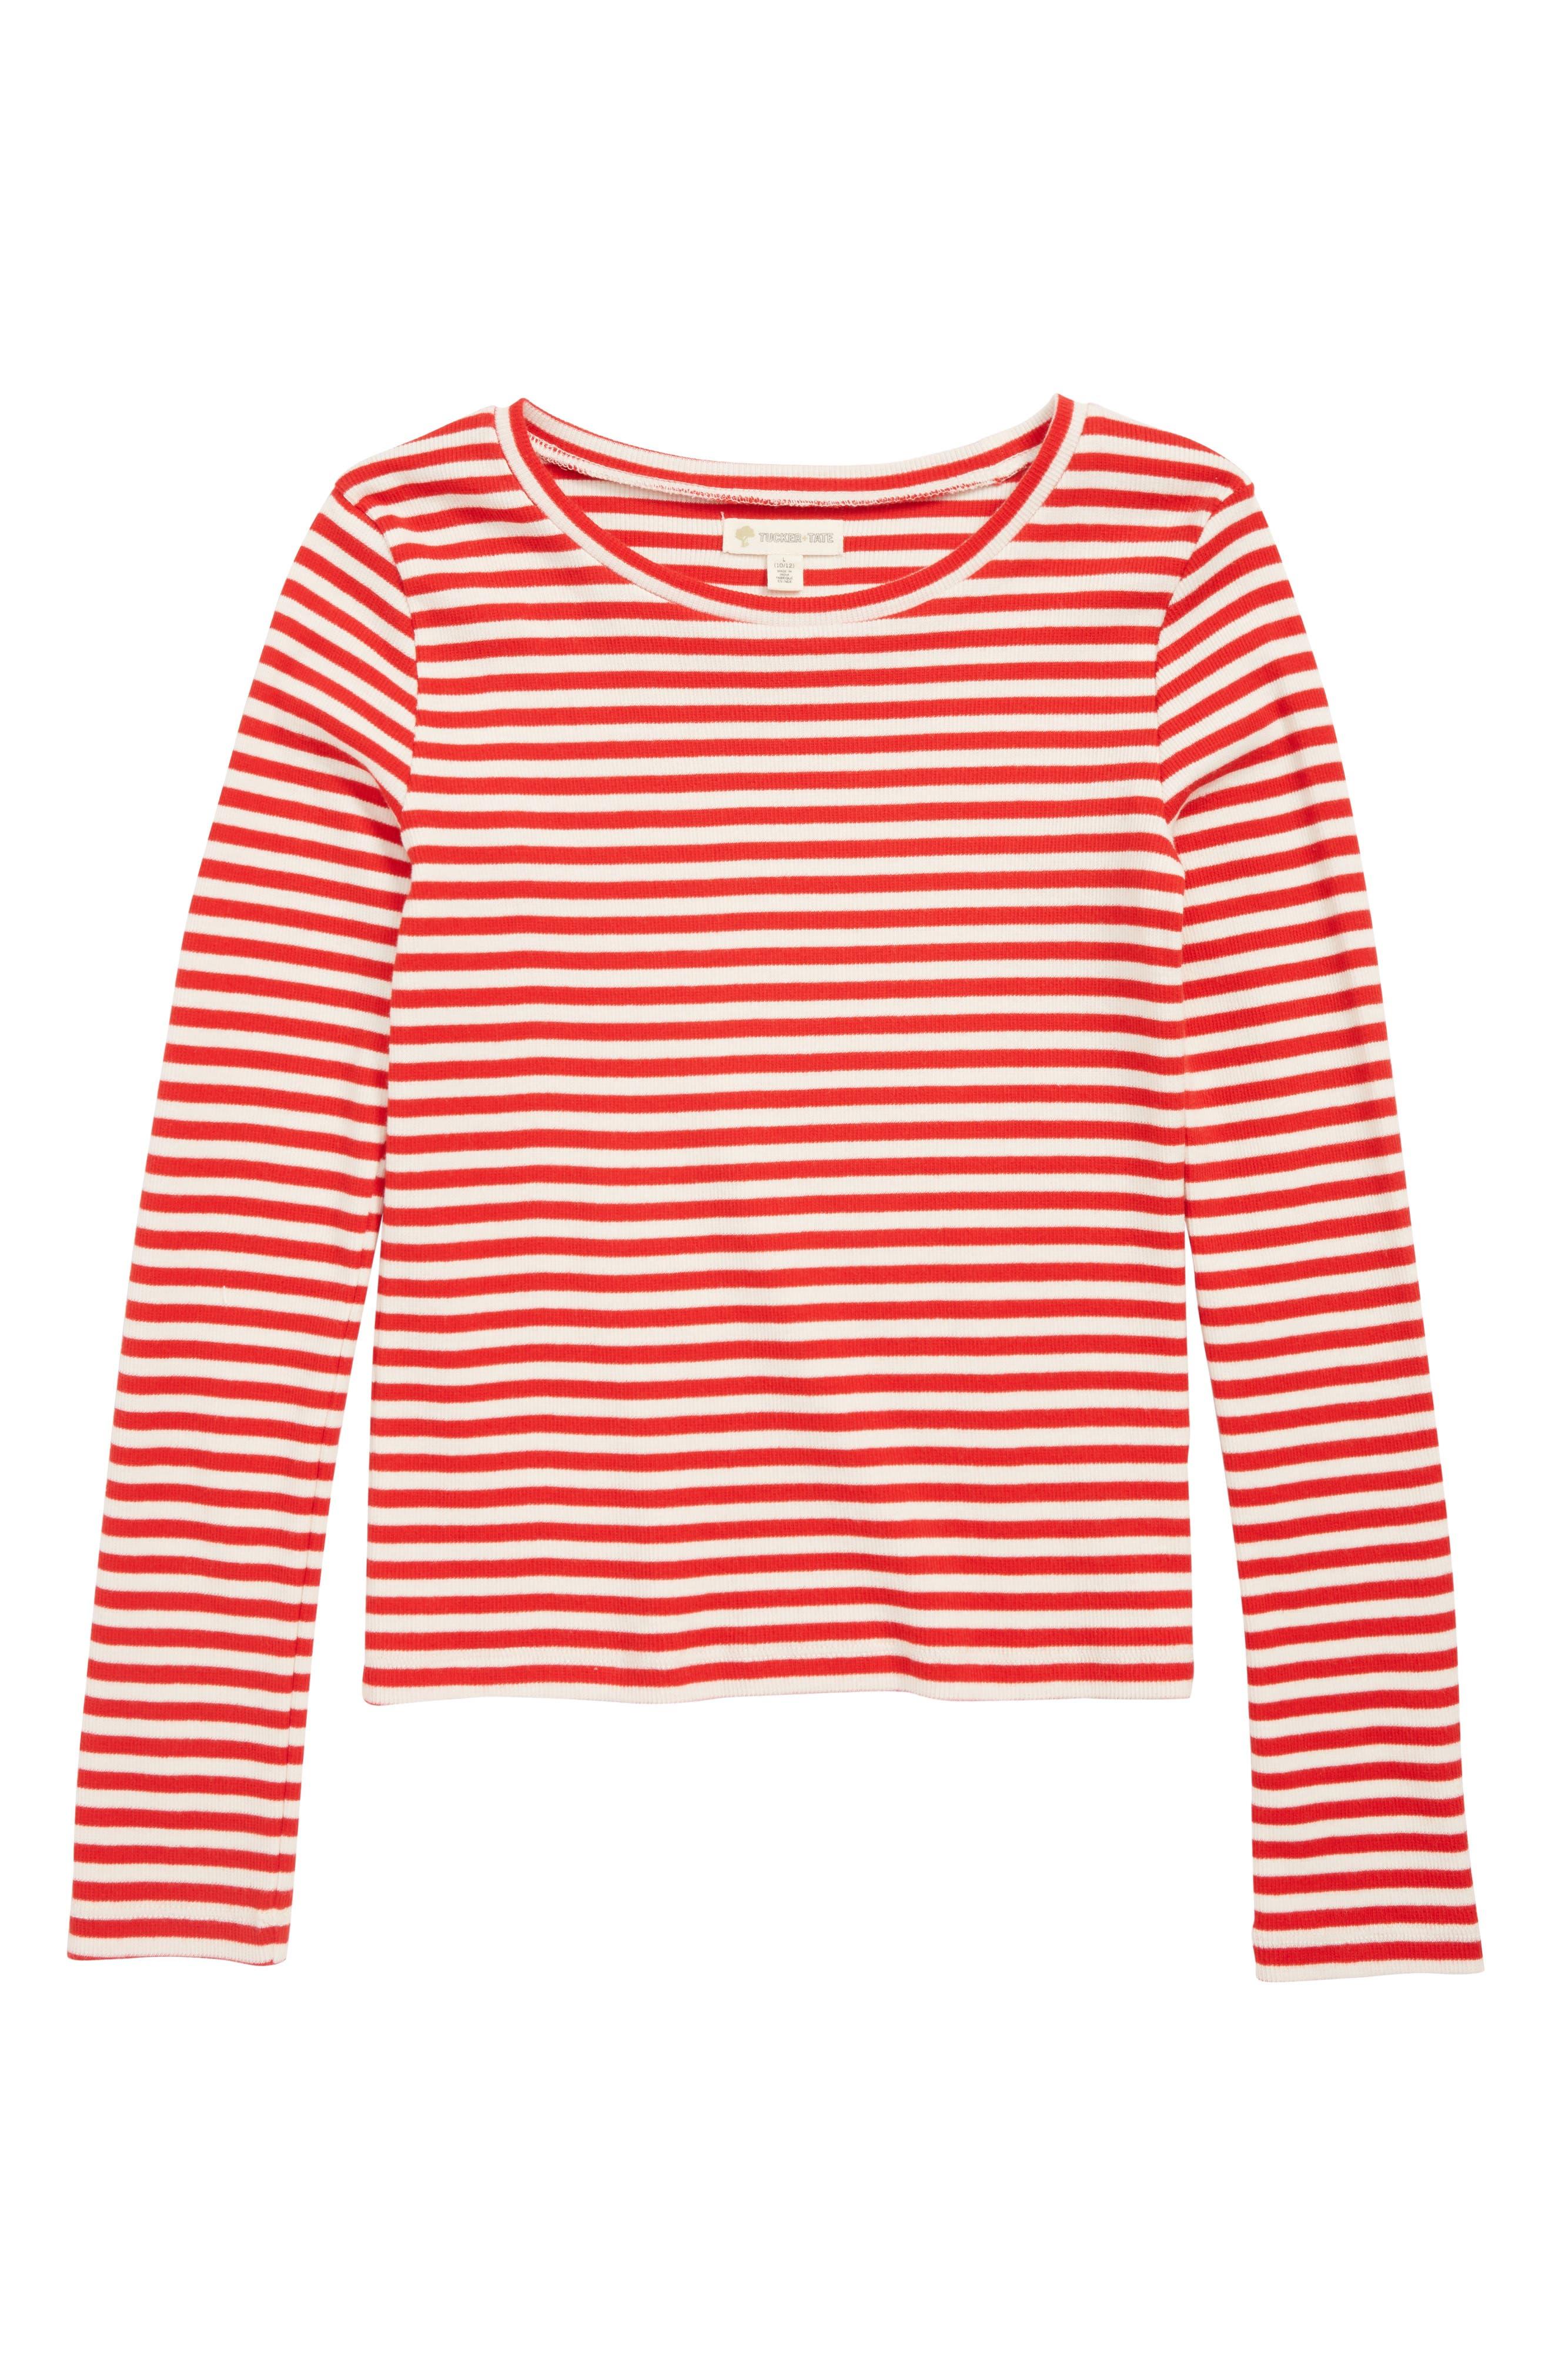 Rib Knit Top,                             Main thumbnail 1, color,                             RED PEPPER STRIPE